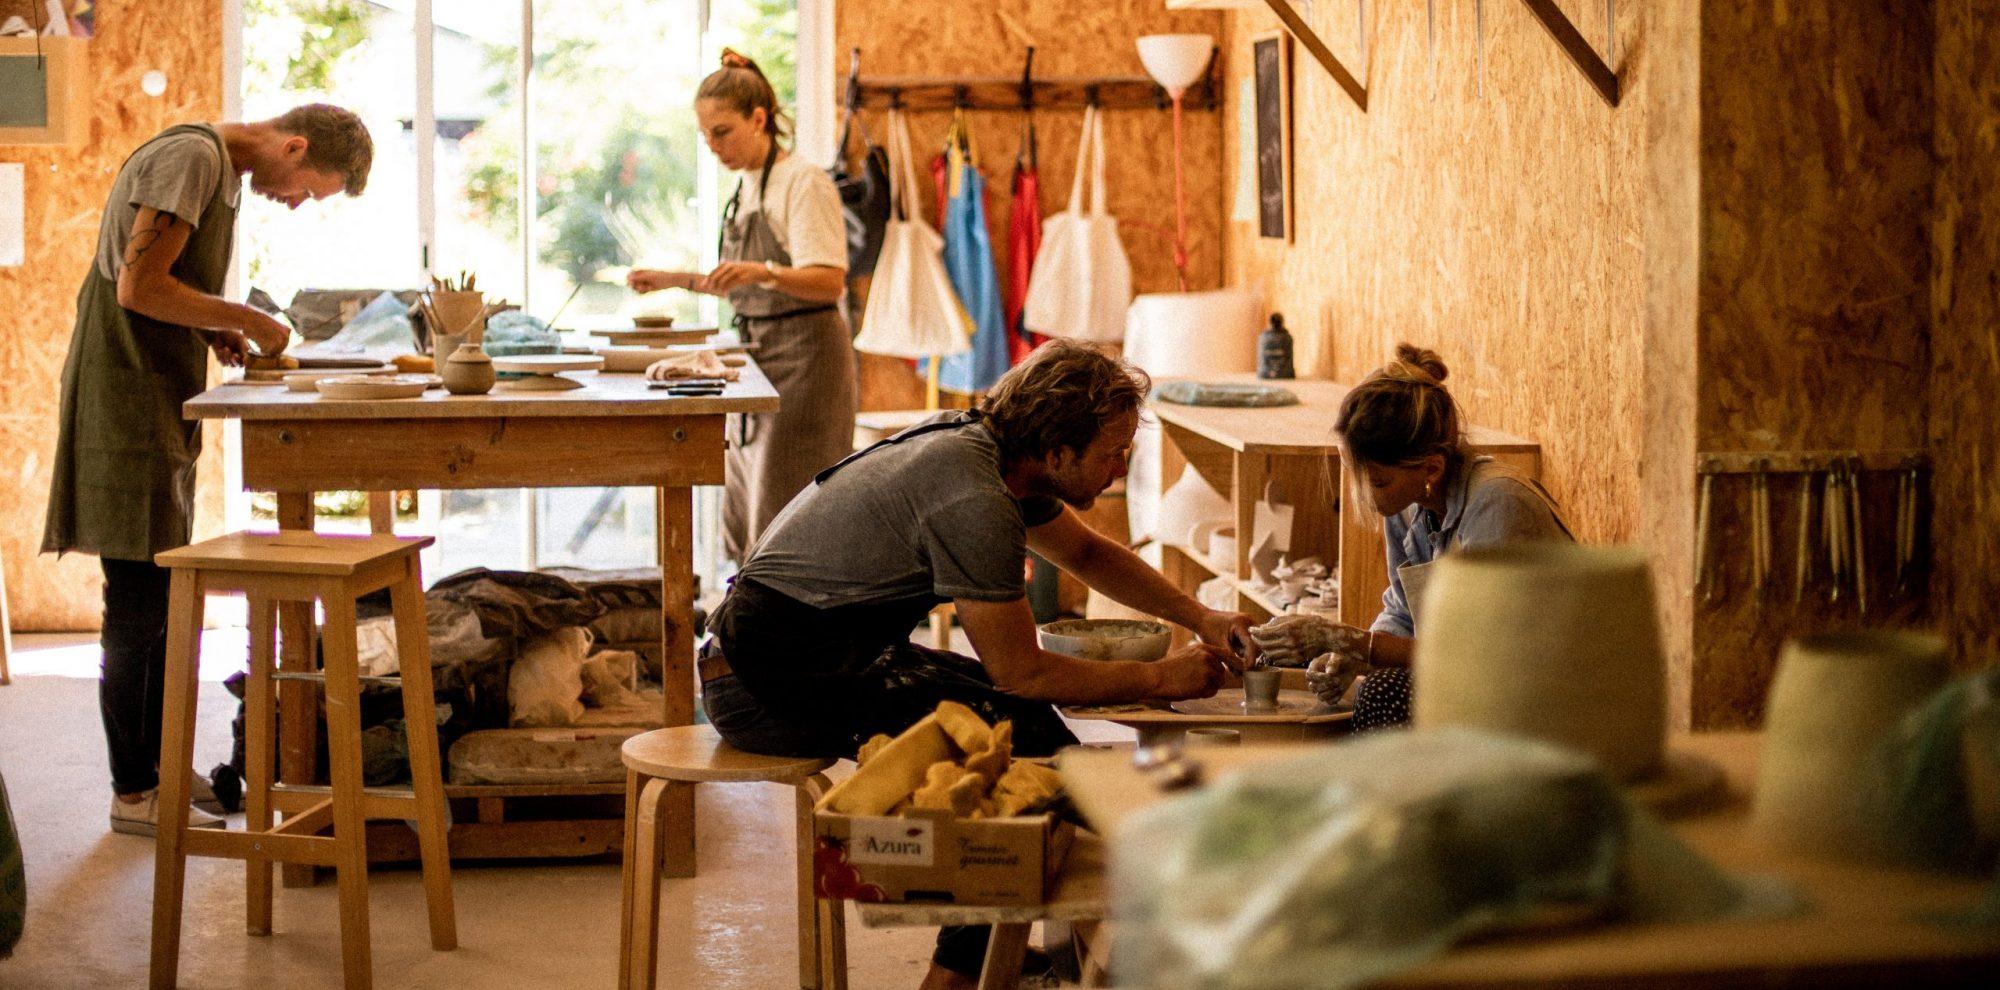 Atelier Xavier Brasleret | Ceramique & poterie